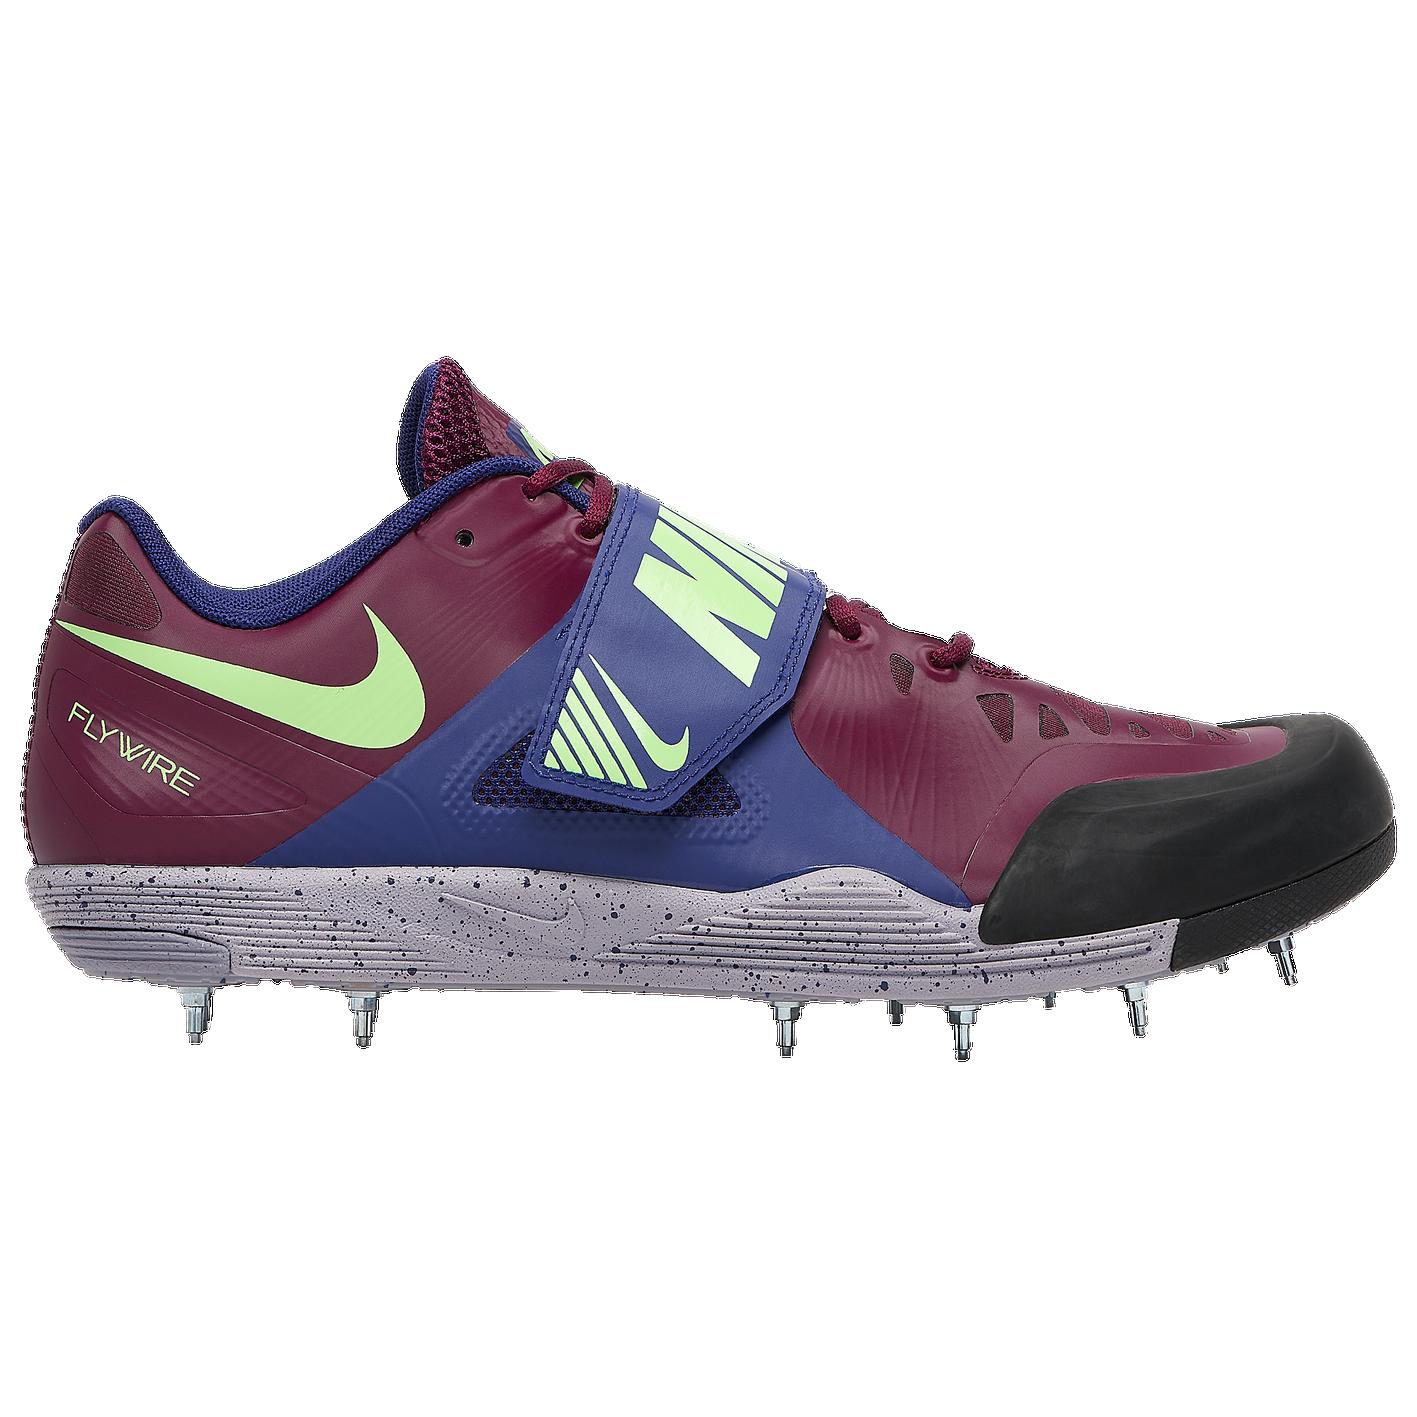 42e59cb6edeb Nike Zoom Javelin Elite 2 - Men s - Track   Field - Shoes - Bordeaux ...